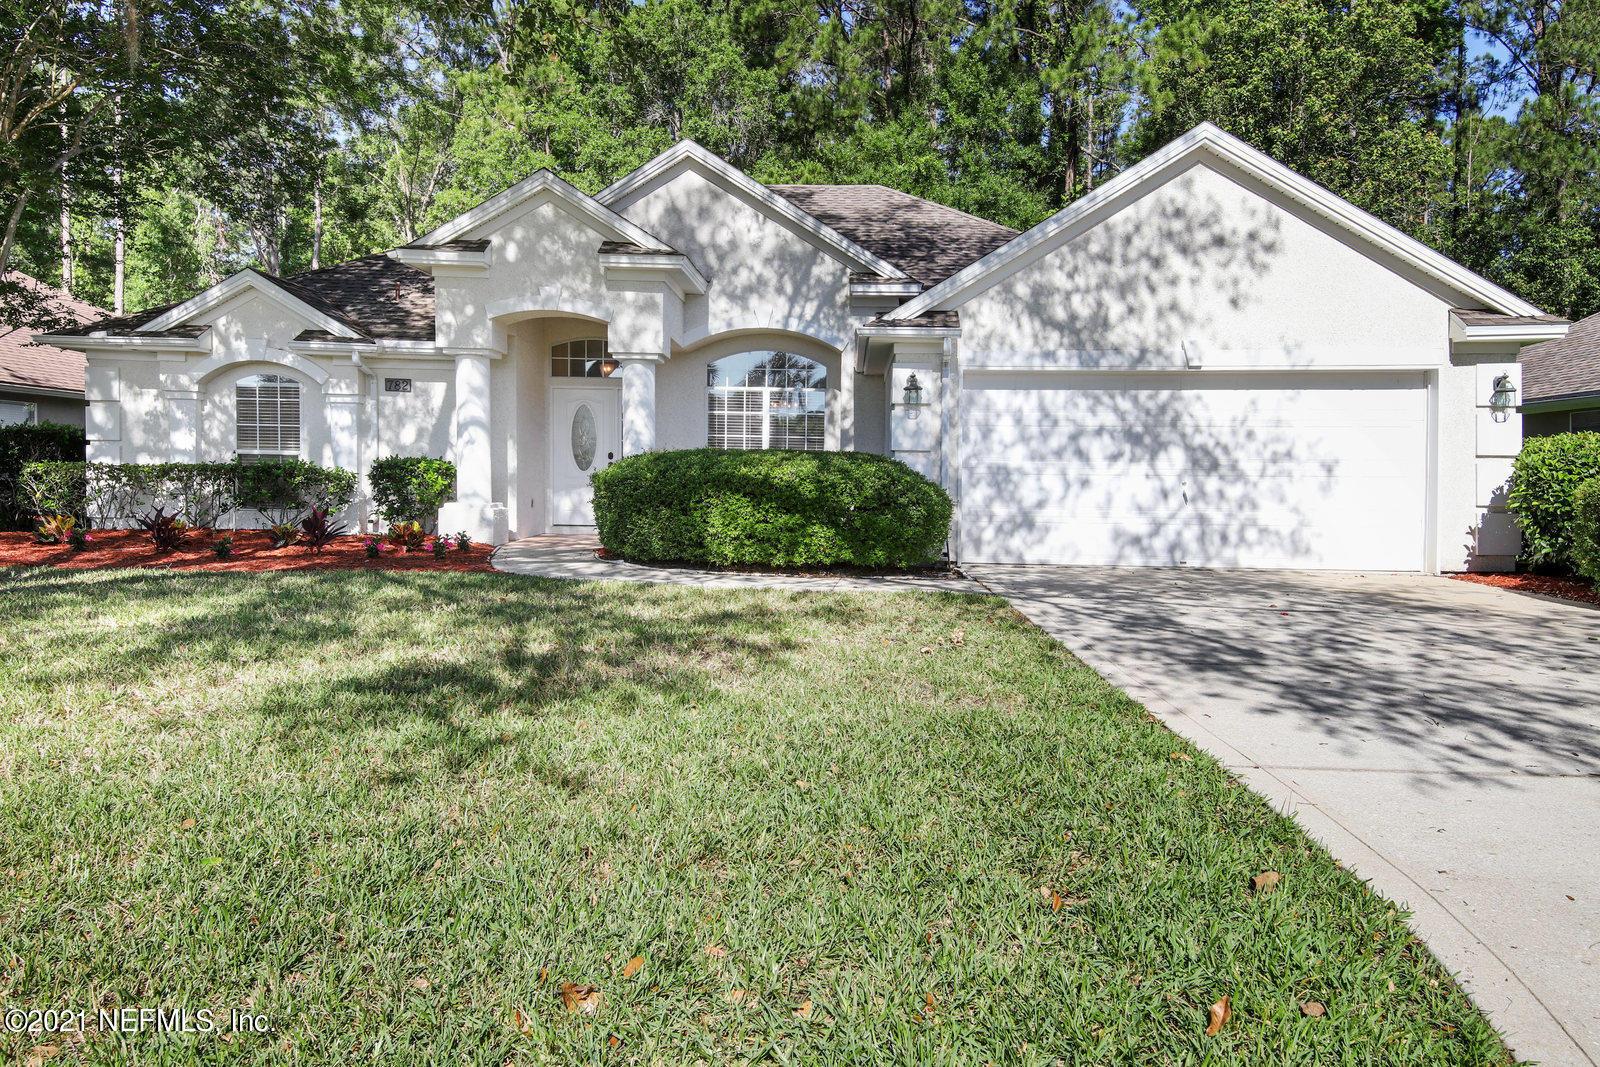 782 WESTMINSTER, ORANGE PARK, FLORIDA 32073, 4 Bedrooms Bedrooms, ,3 BathroomsBathrooms,Residential,For sale,WESTMINSTER,1108554